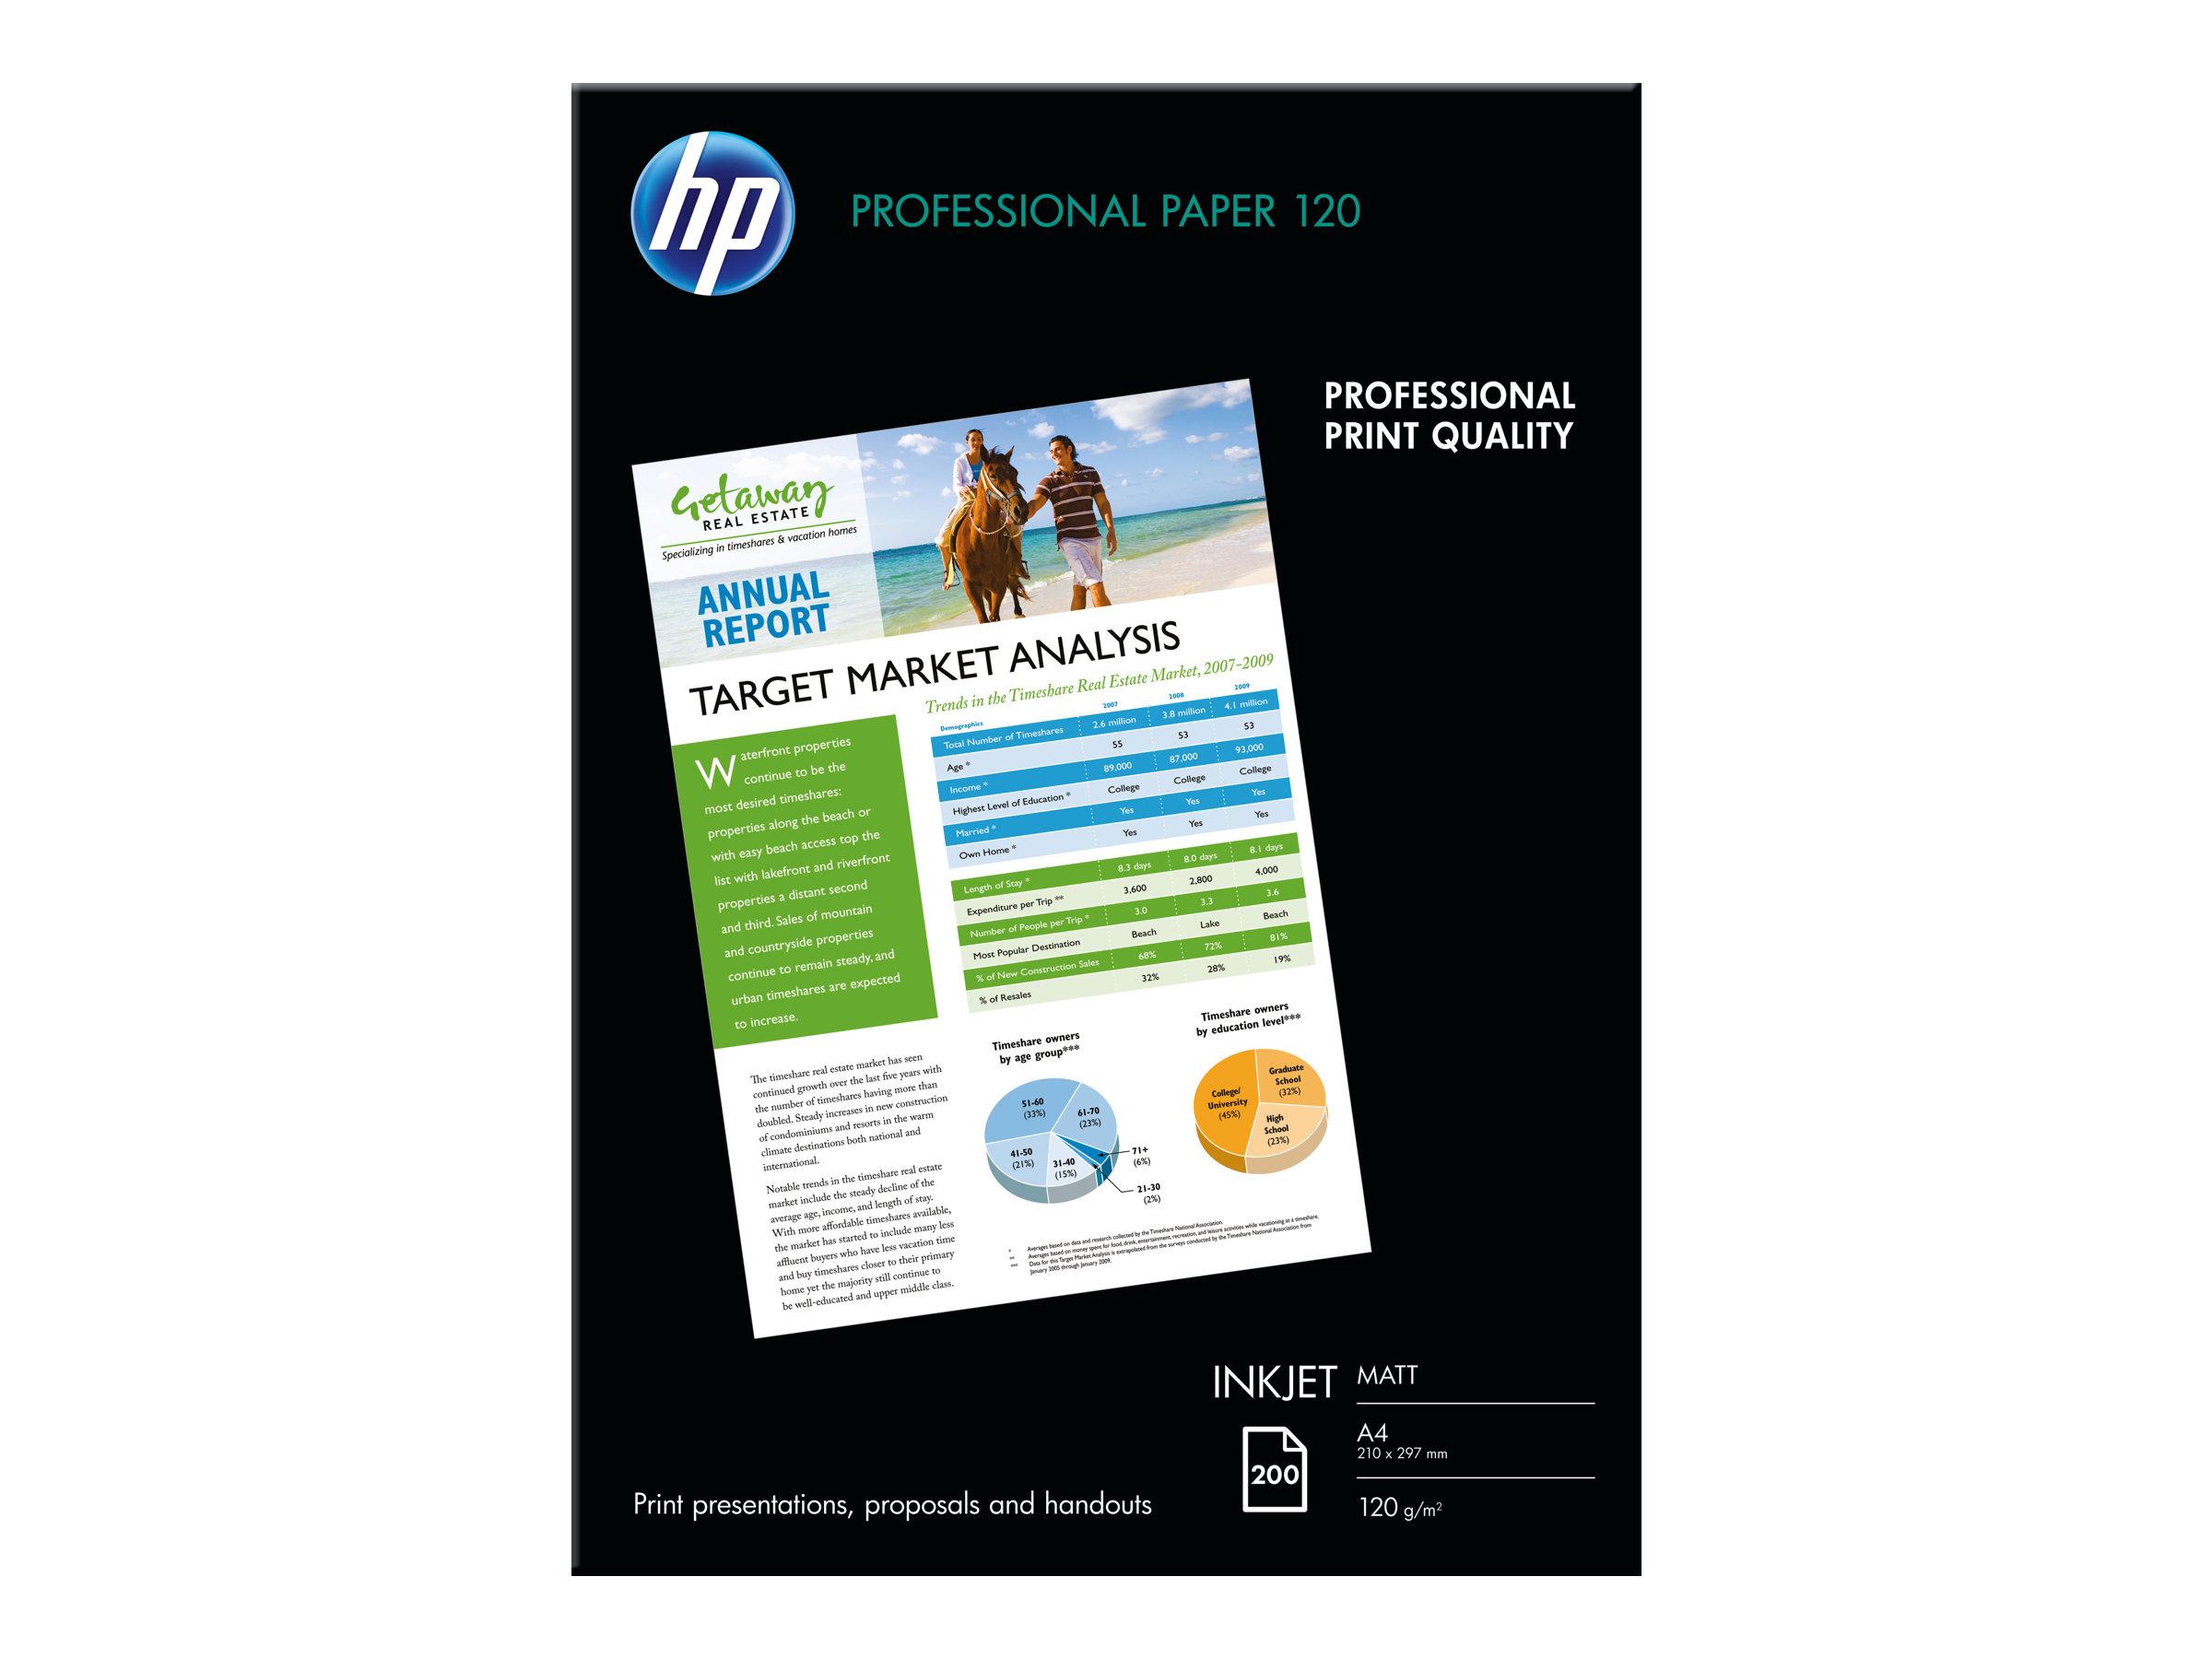 HP Professional 120 matt - Matt